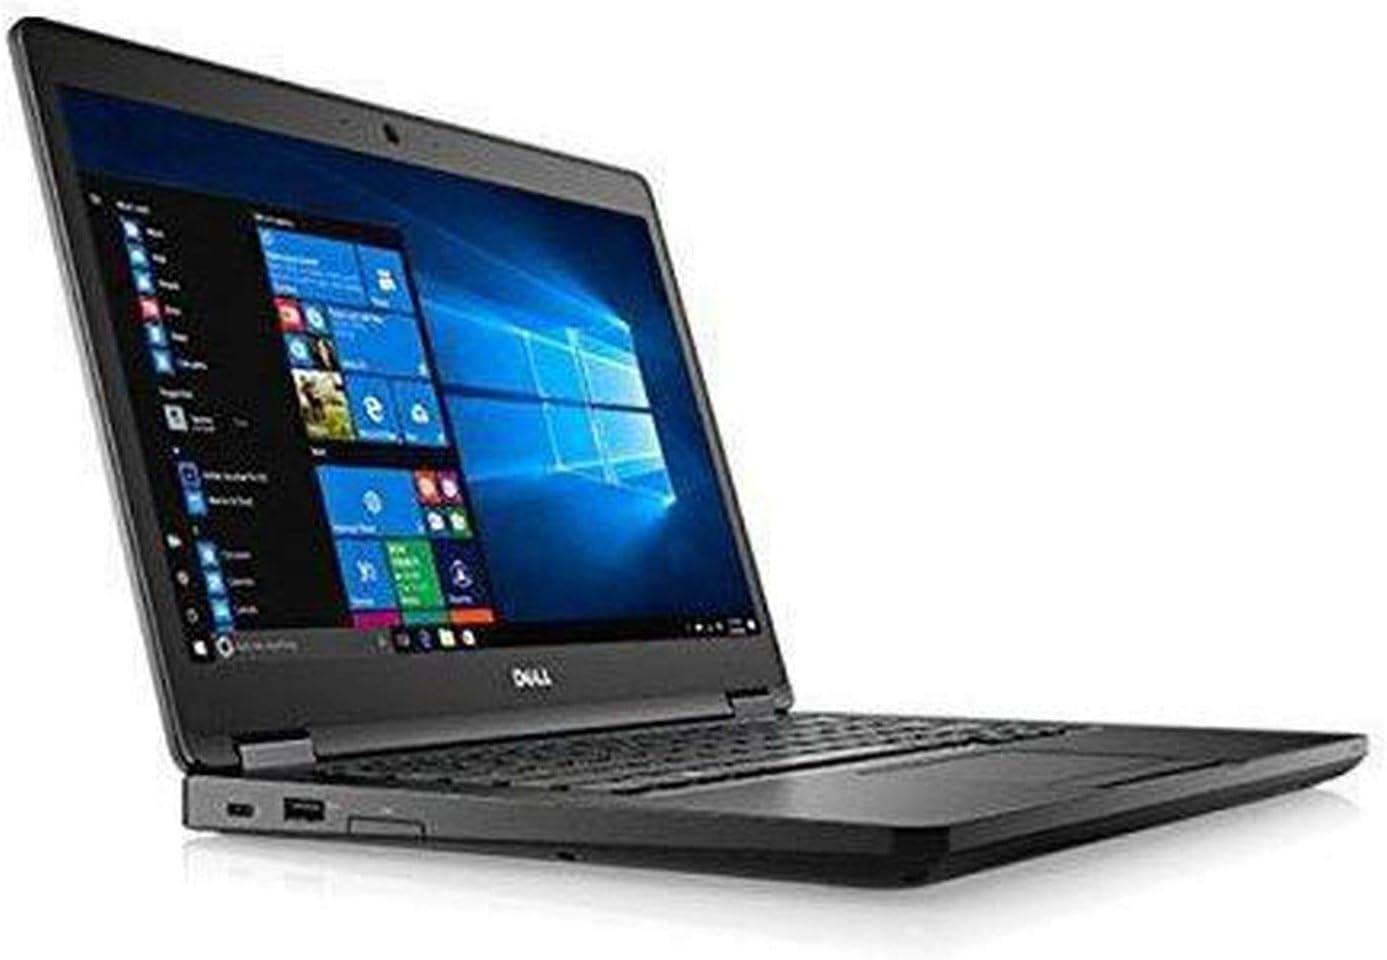 Dell Latitude 5480 Laptop 14 - Intel Core i5 7th Gen - i5-7440HQ - Dual Core 3.8Ghz - 256GB SSD - 8GB RAM - 1920x1080 FHD - Windows 10 Pro